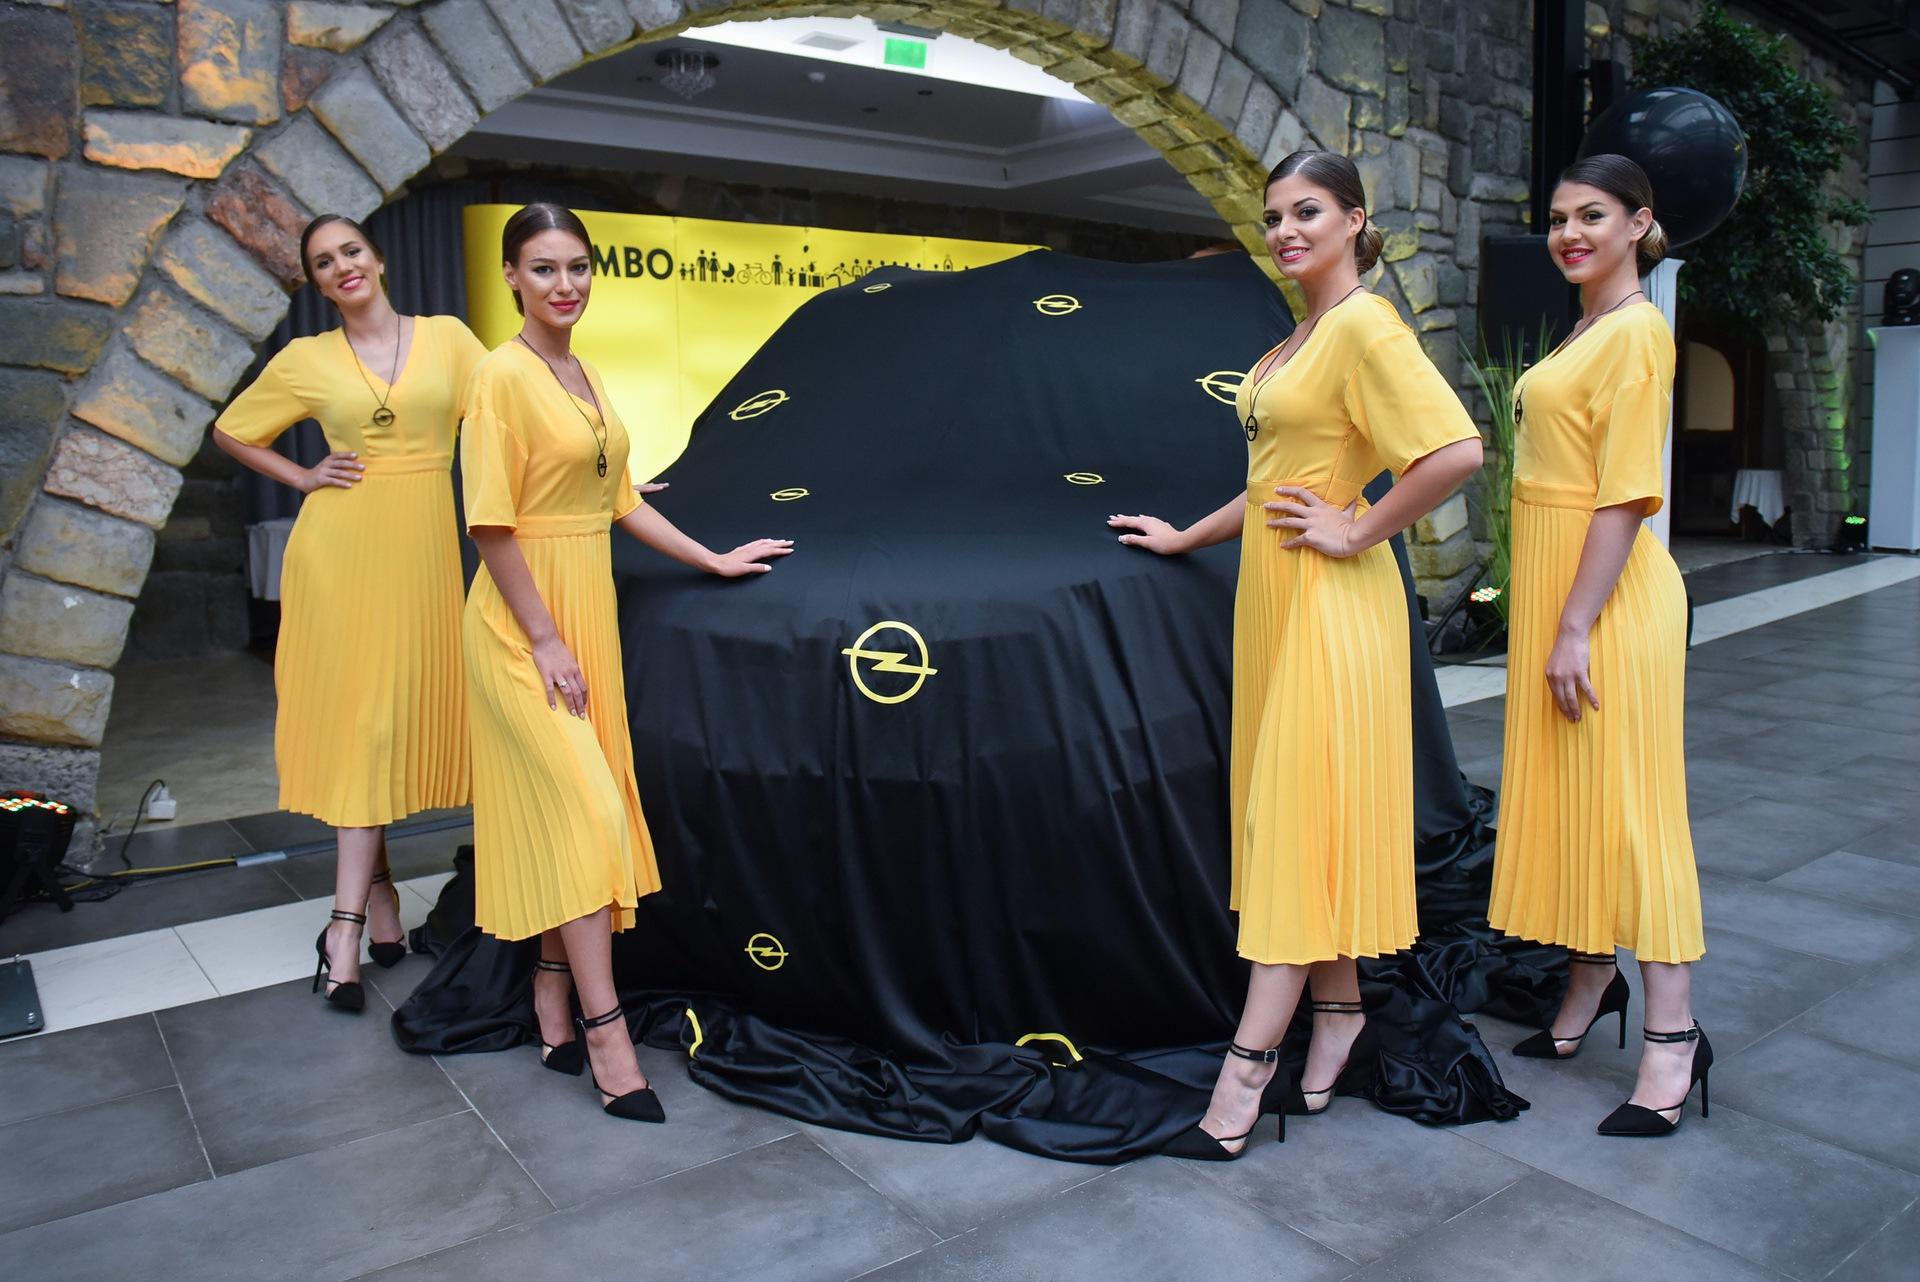 Opel_Combo_Life_static_0005